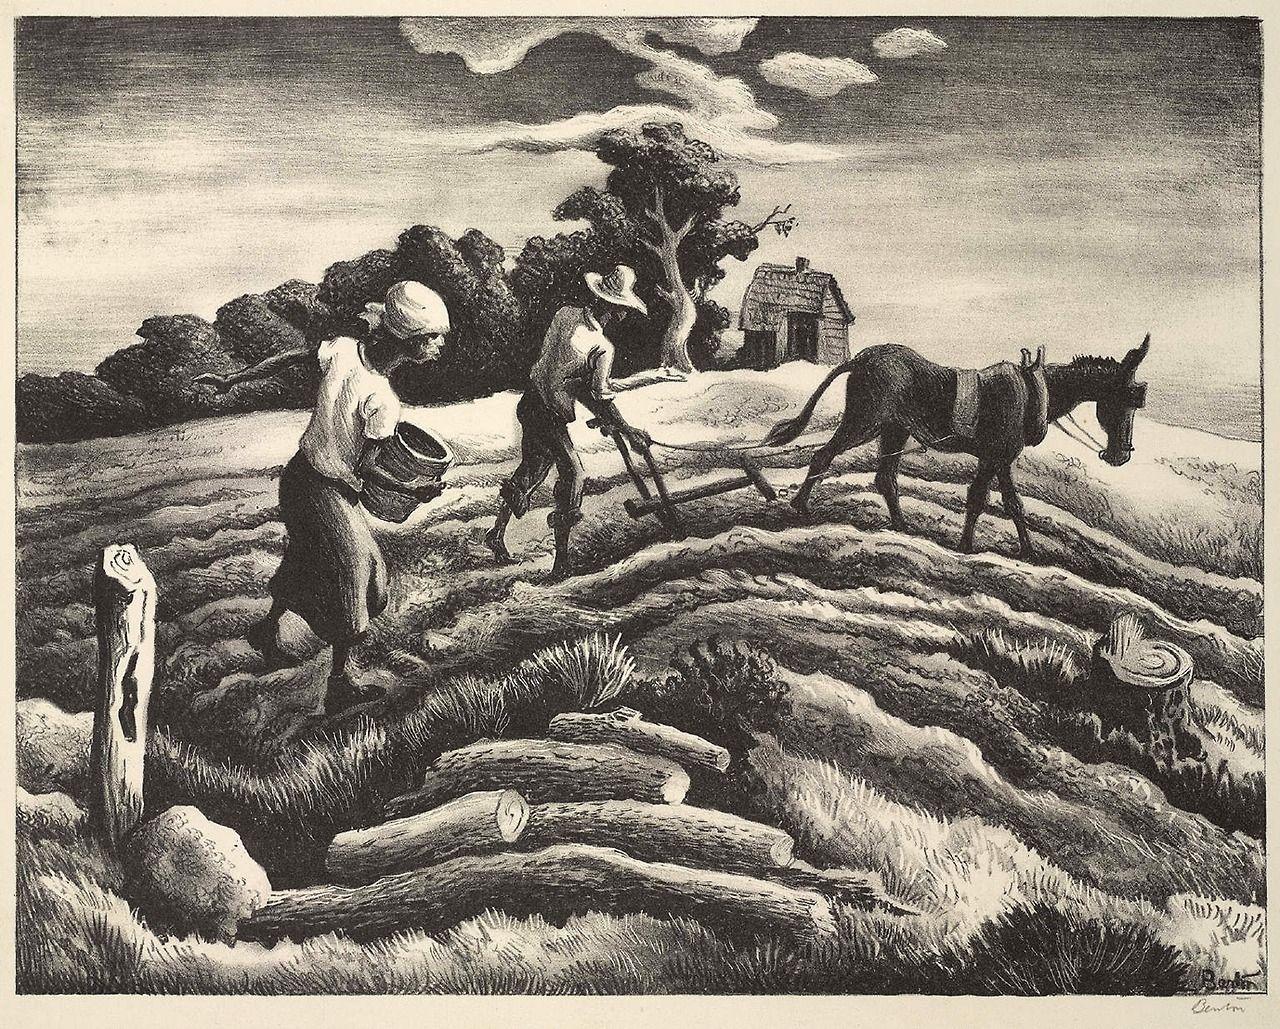 Planting, 1939 lithograph, Thomas Hart Benton